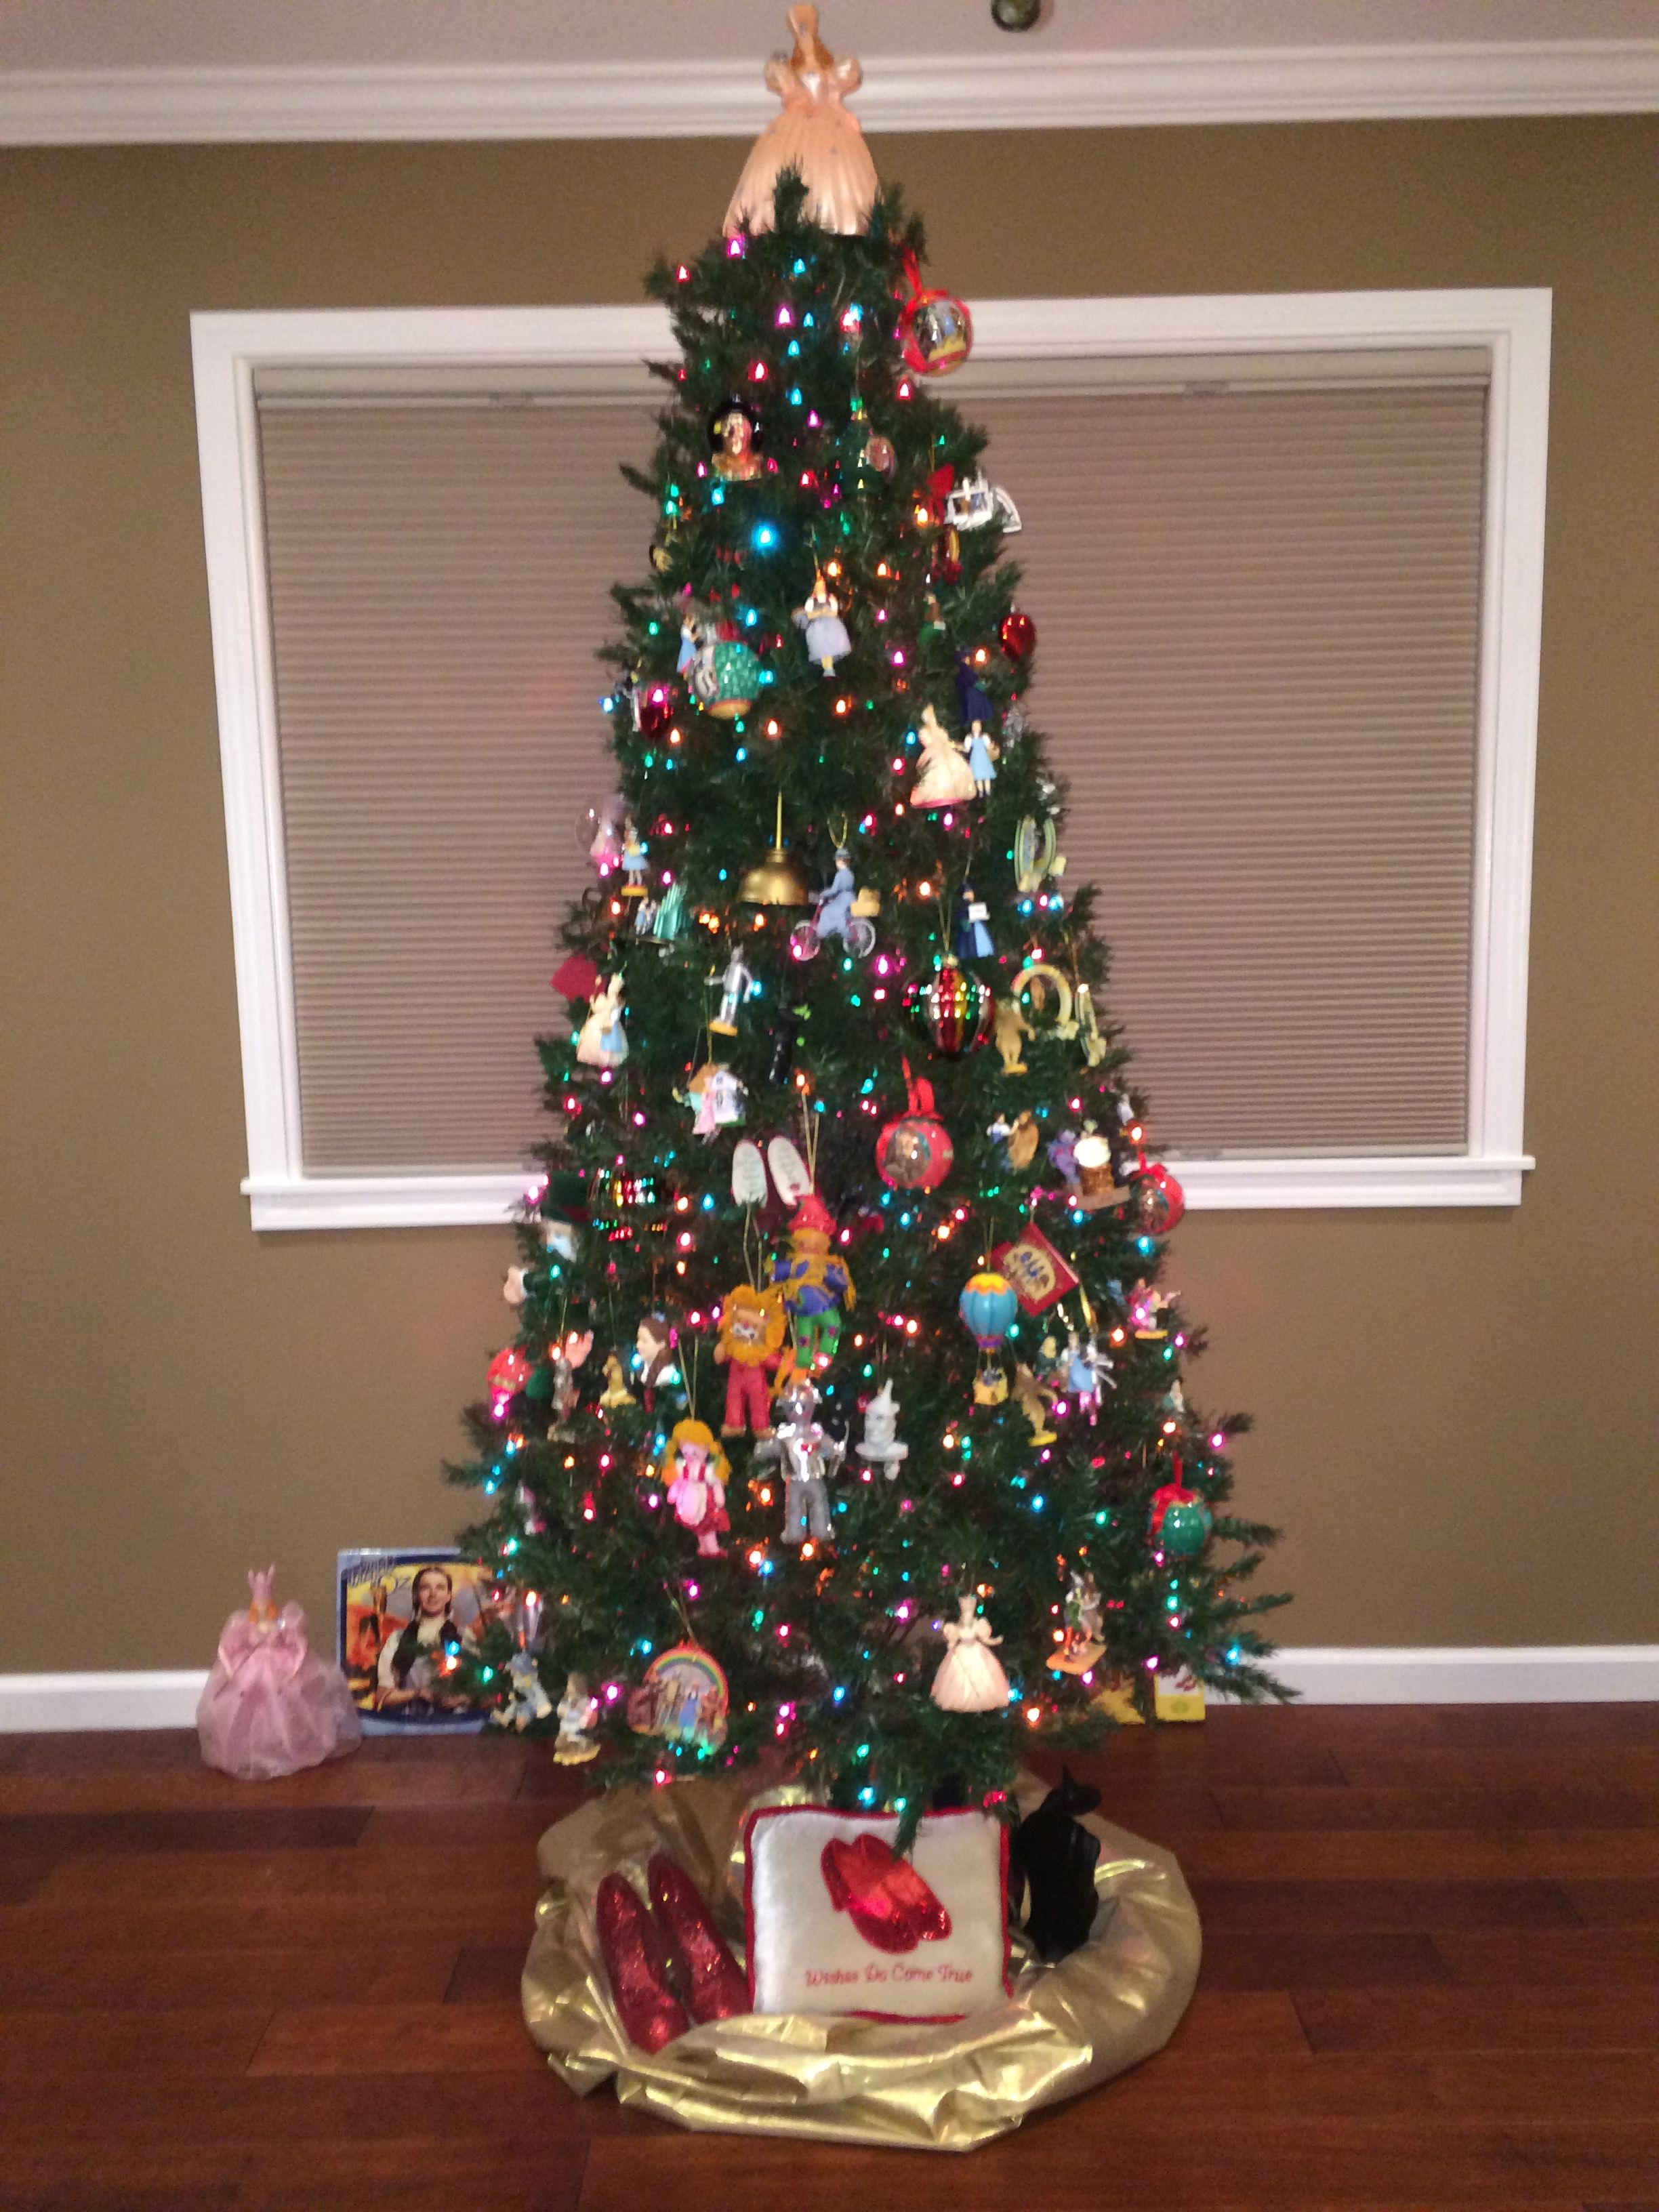 Wizard of Oz Christmas tree | Christmas decorations ...